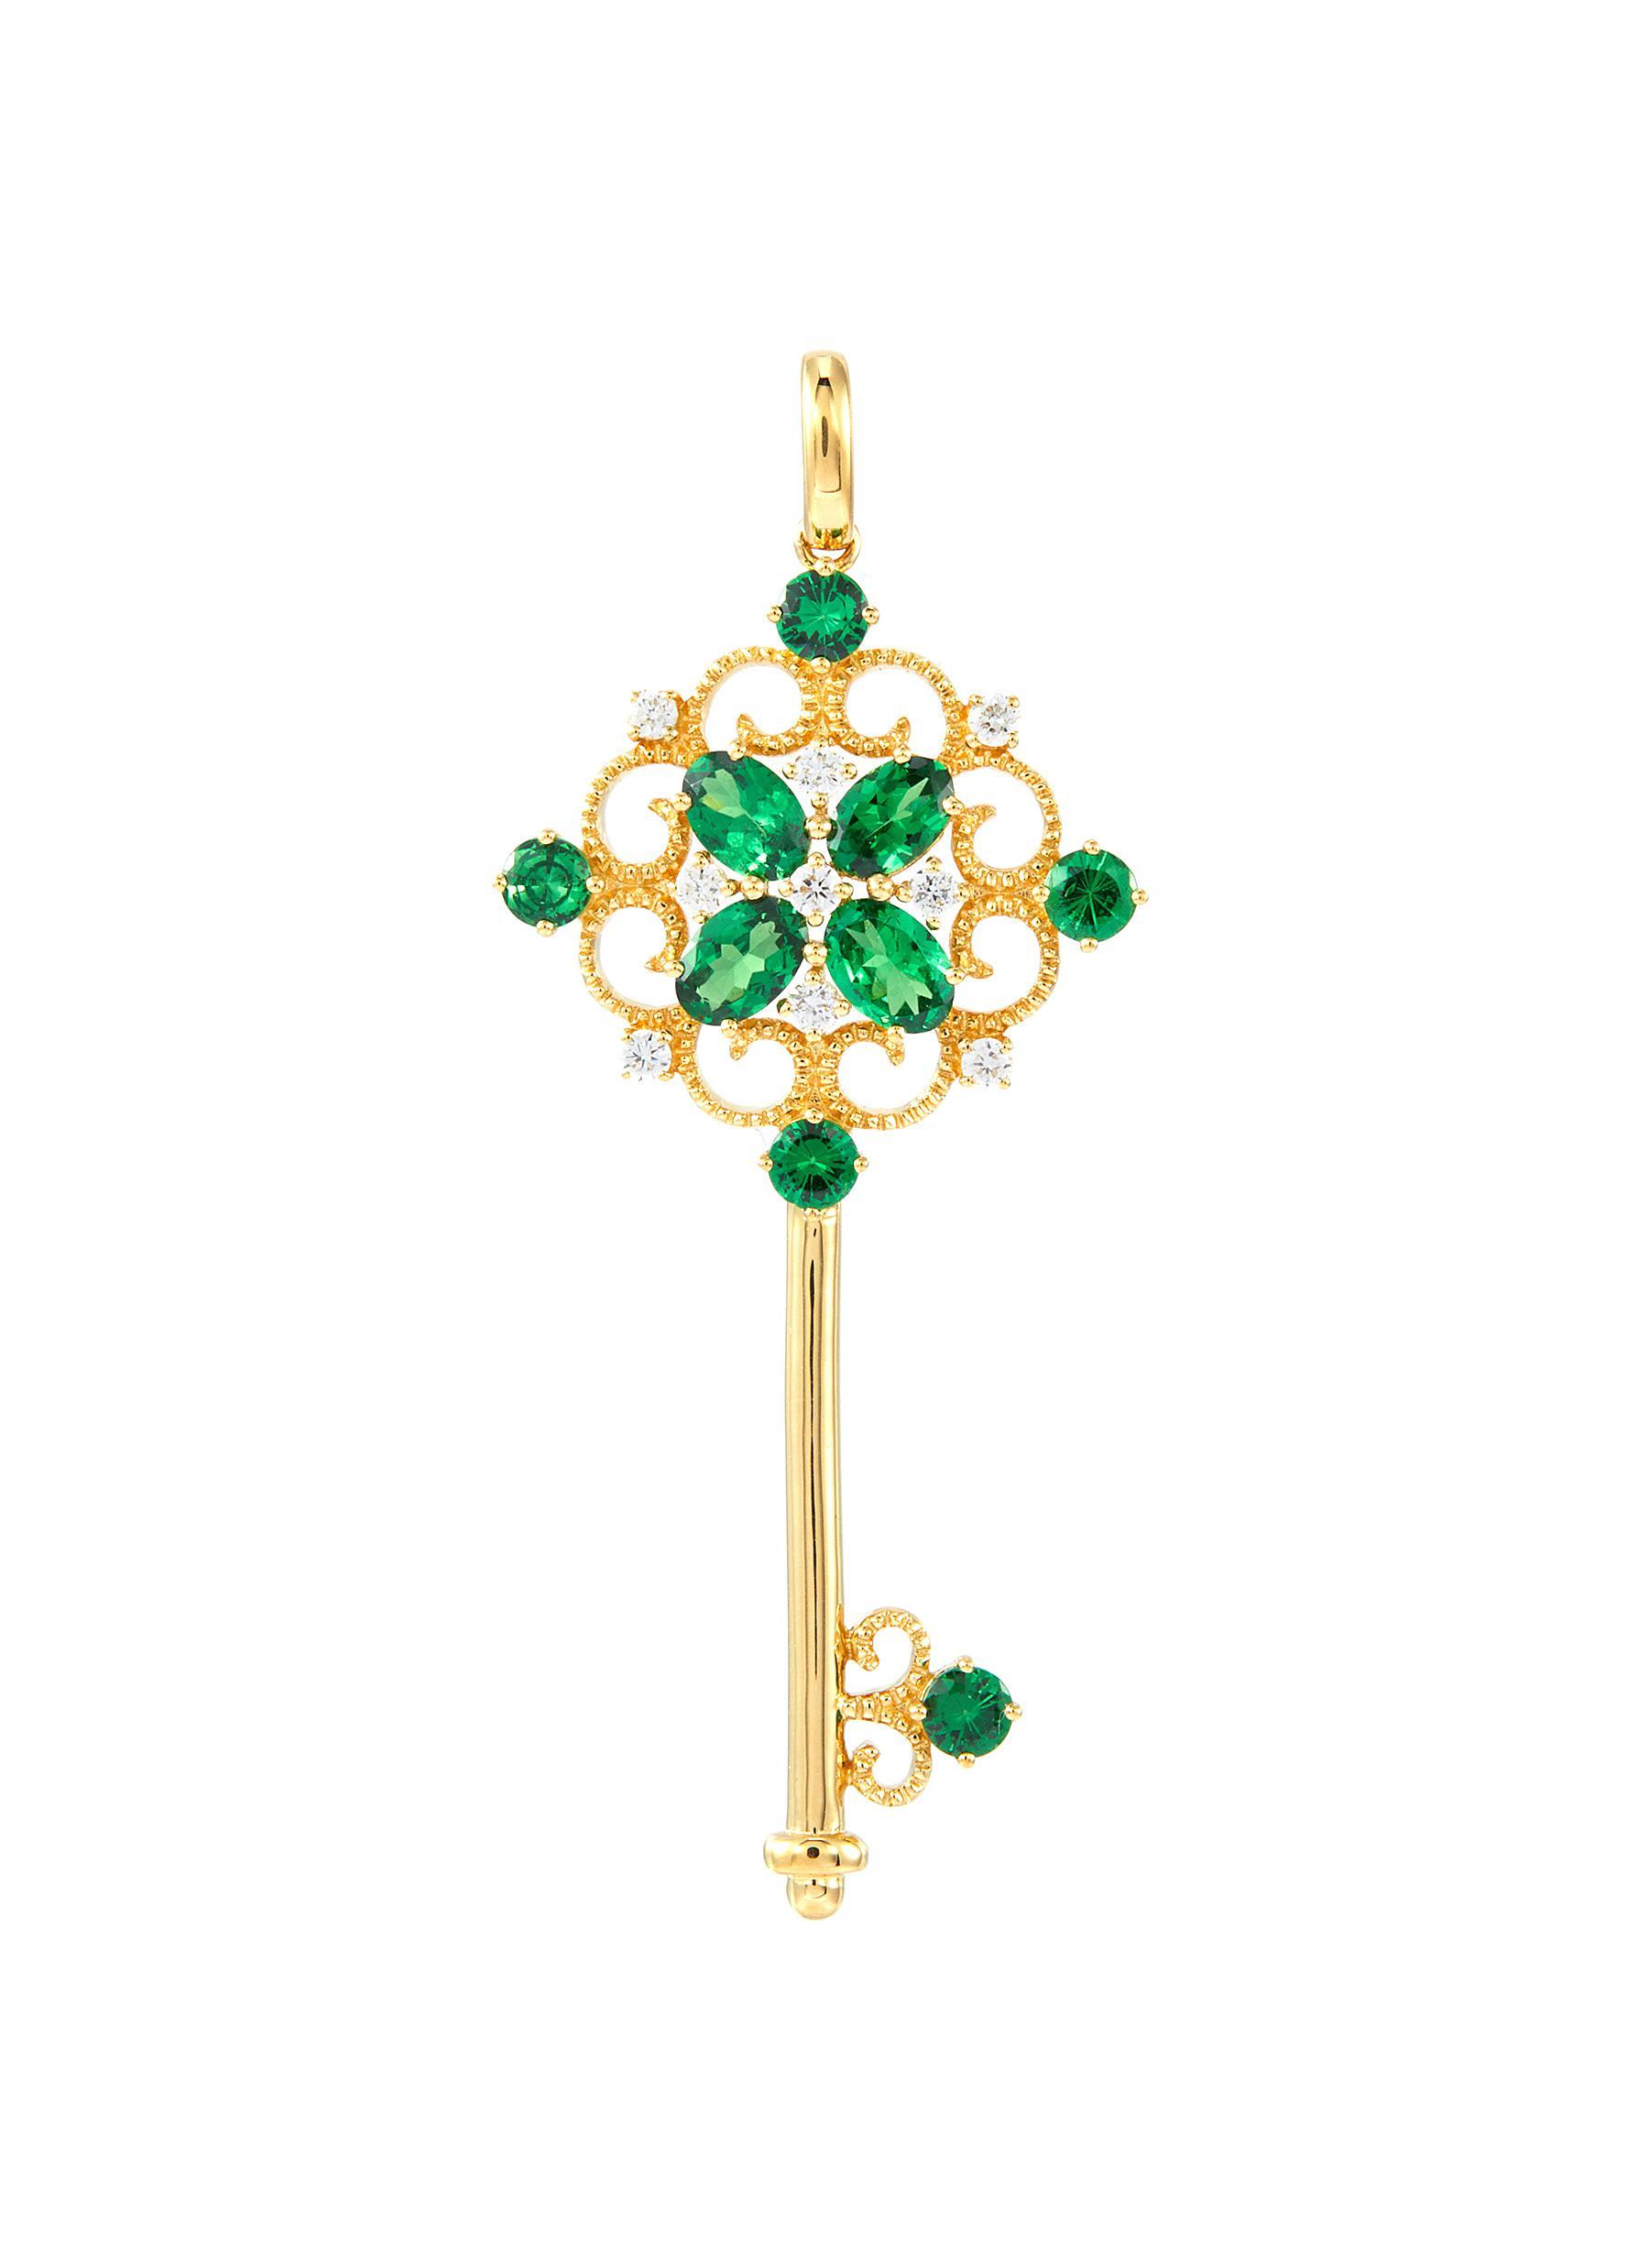 Diamond garnet 18k yellow gold openwork key pendant